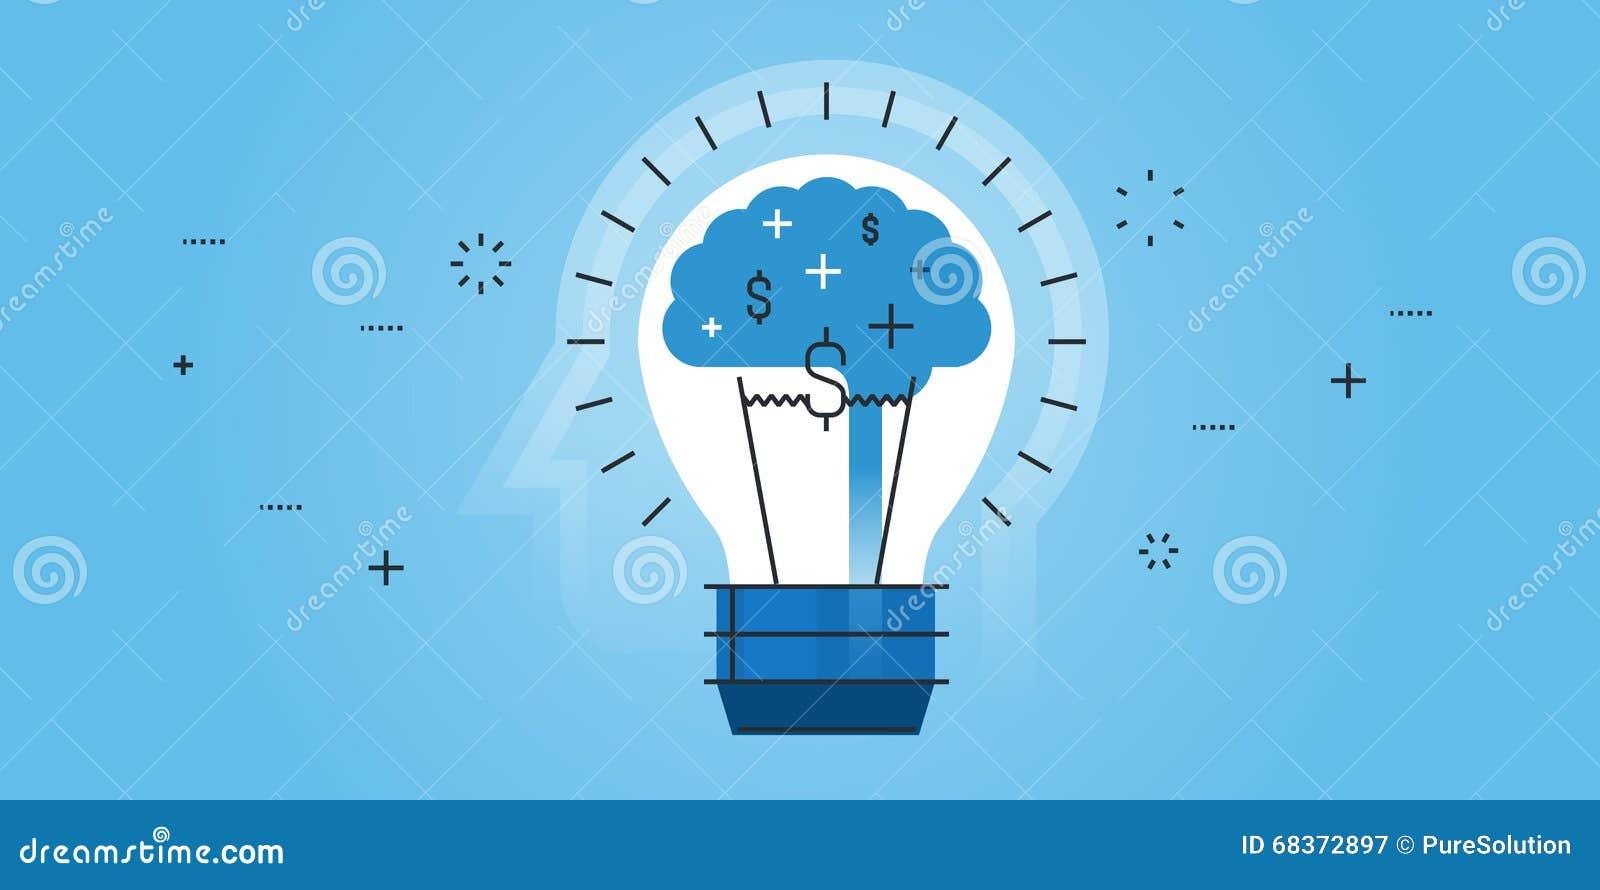 Line Design Ideas : Flat line design website banner of big idea stock vector